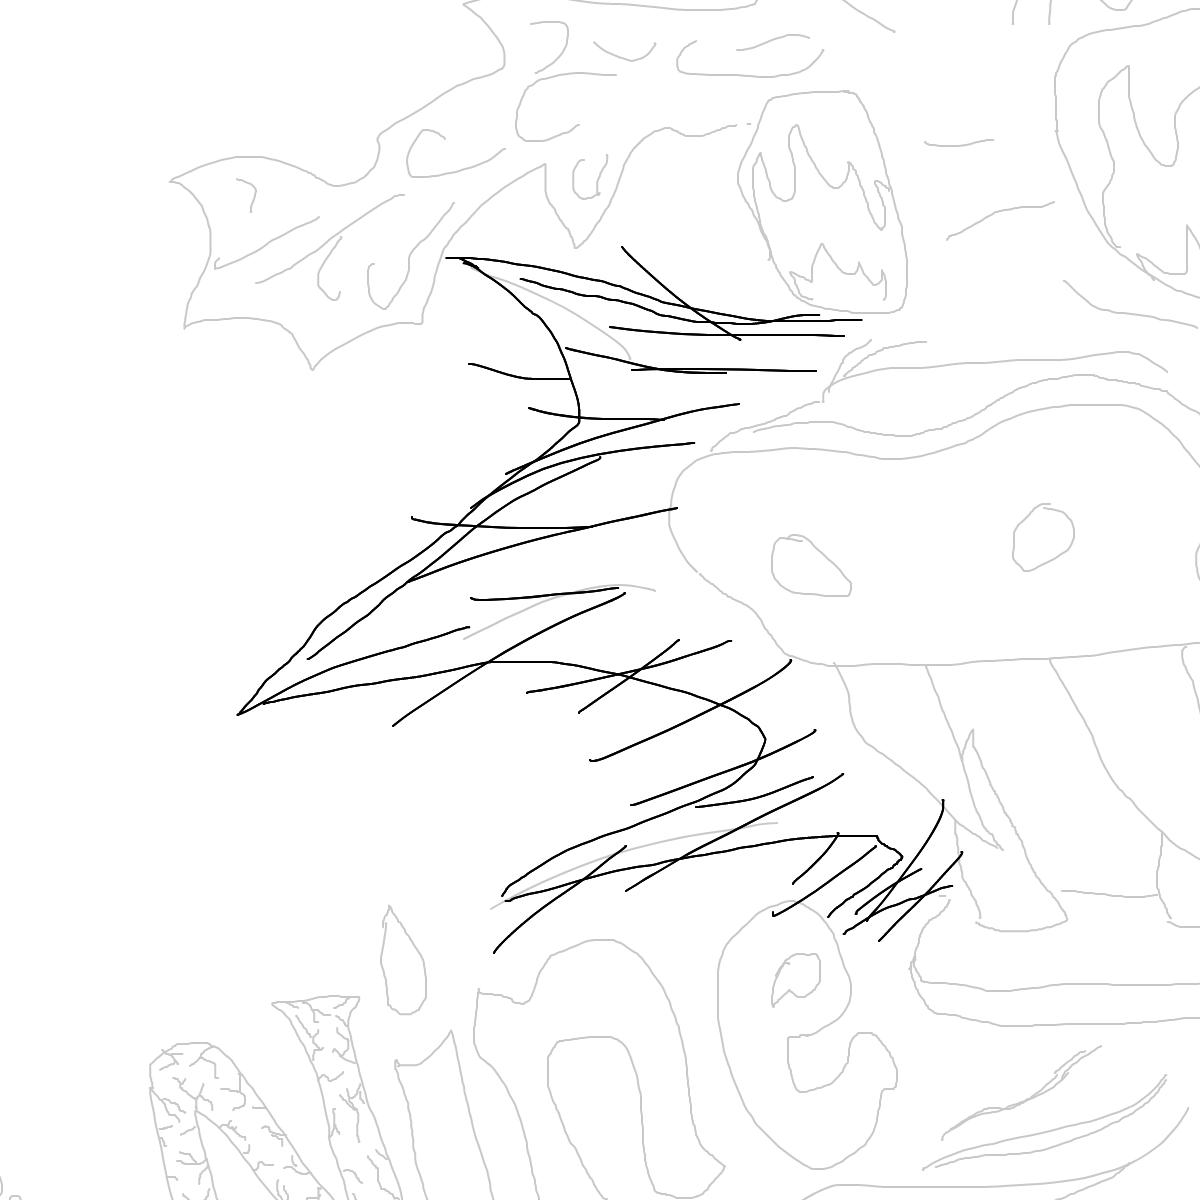 BAAAM drawing#23925 lat:78.4174652099609400lng: -4.4293212890625000